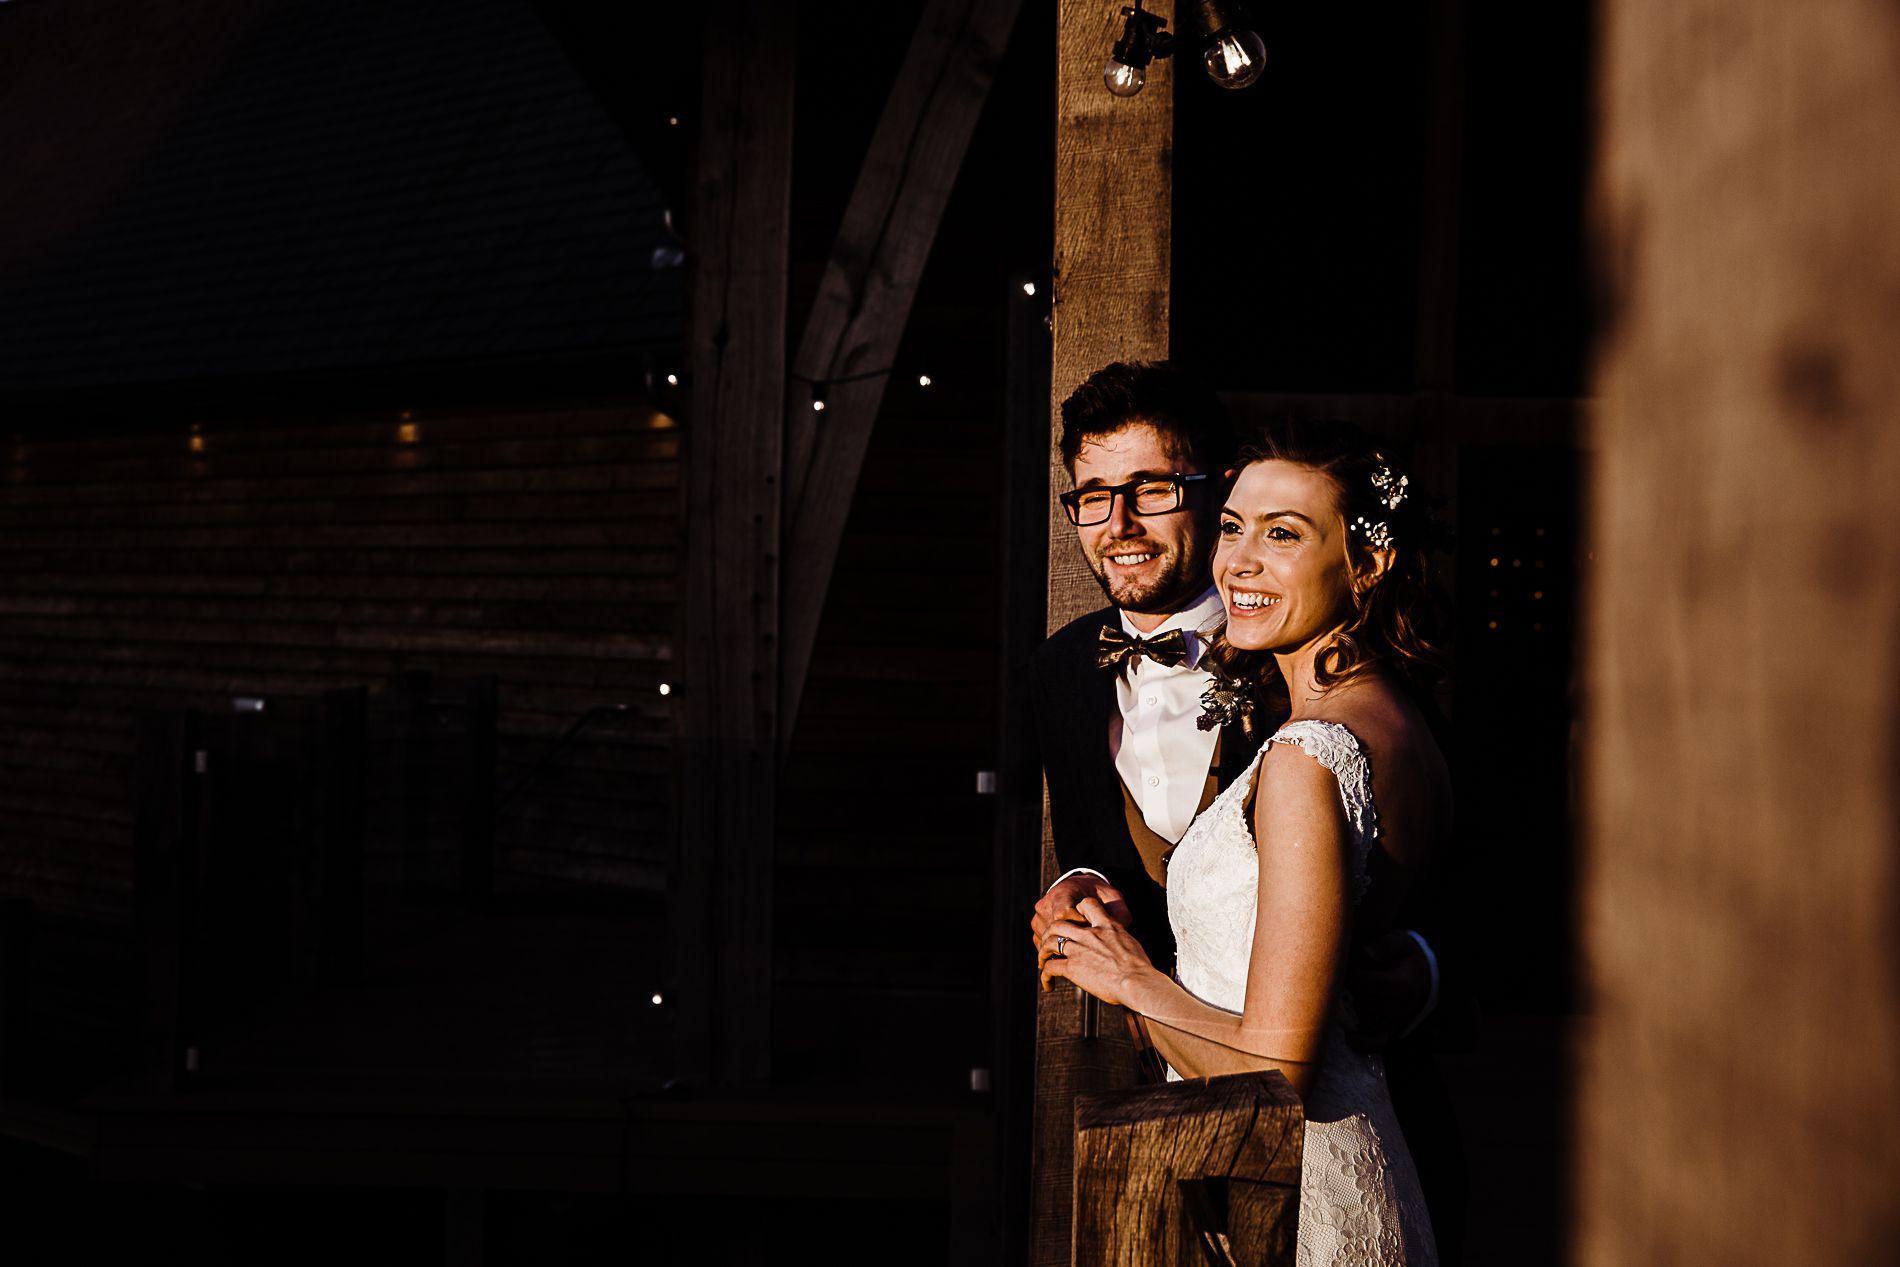 Lichfield wedding photographer romantic wedding photography